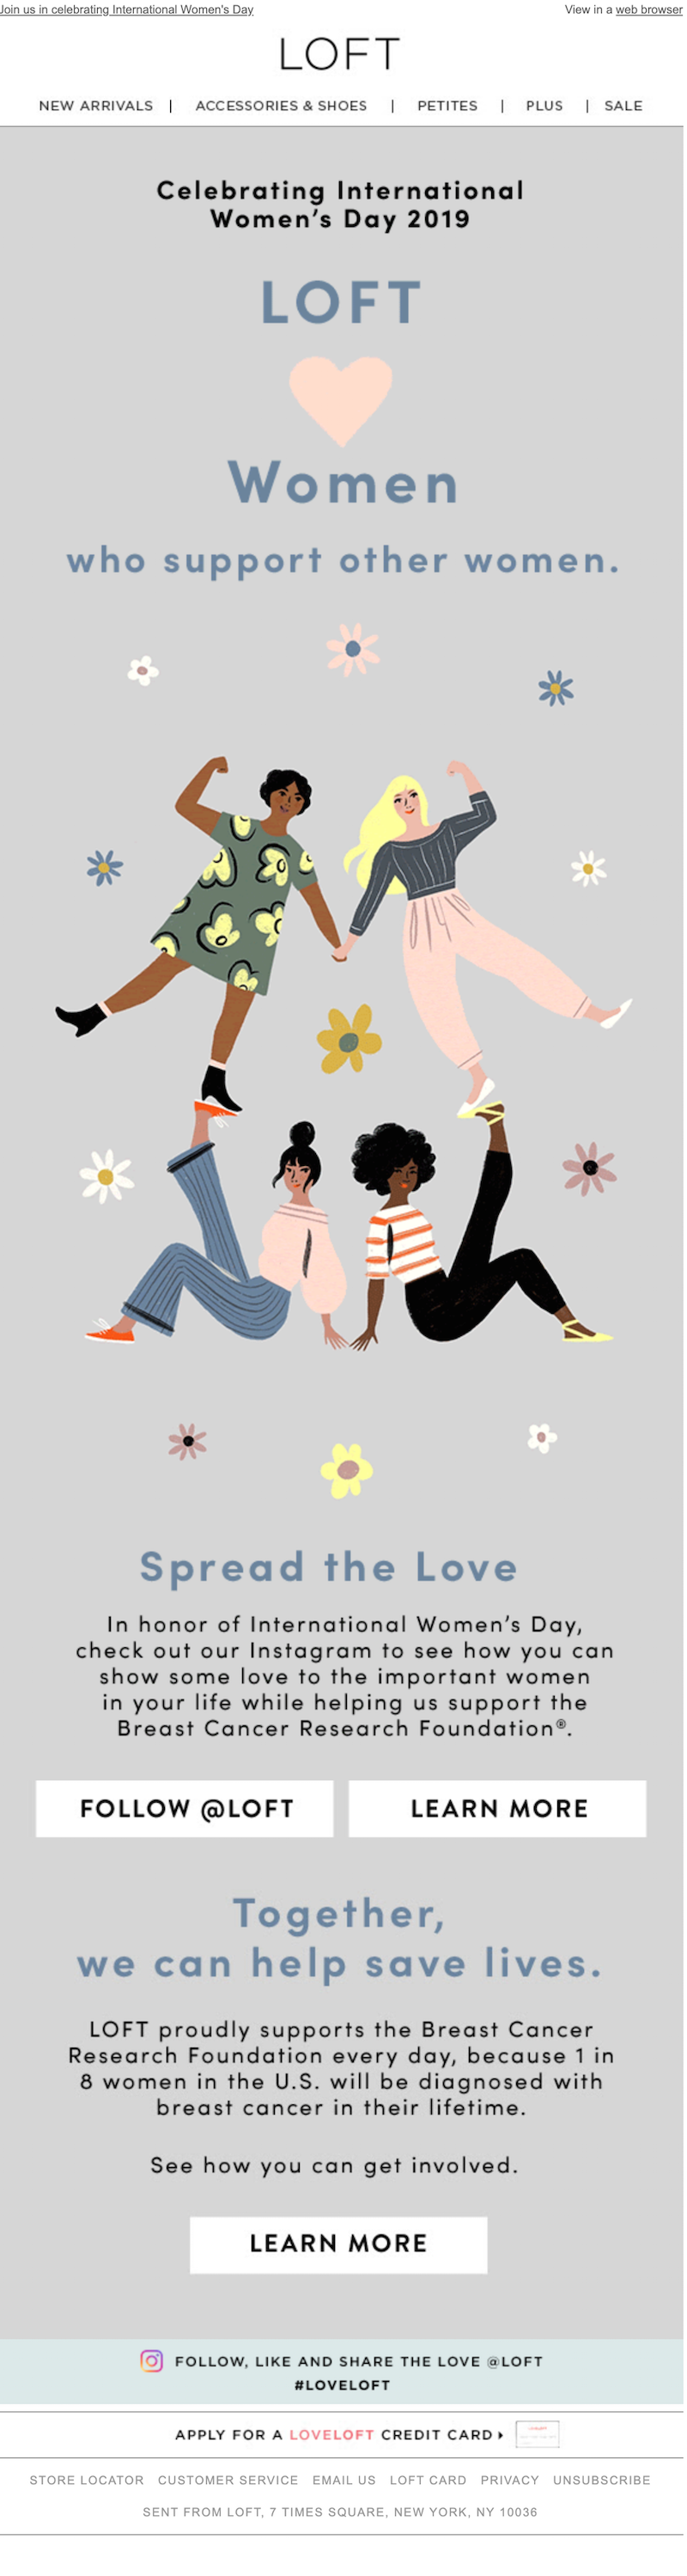 international women's day email design